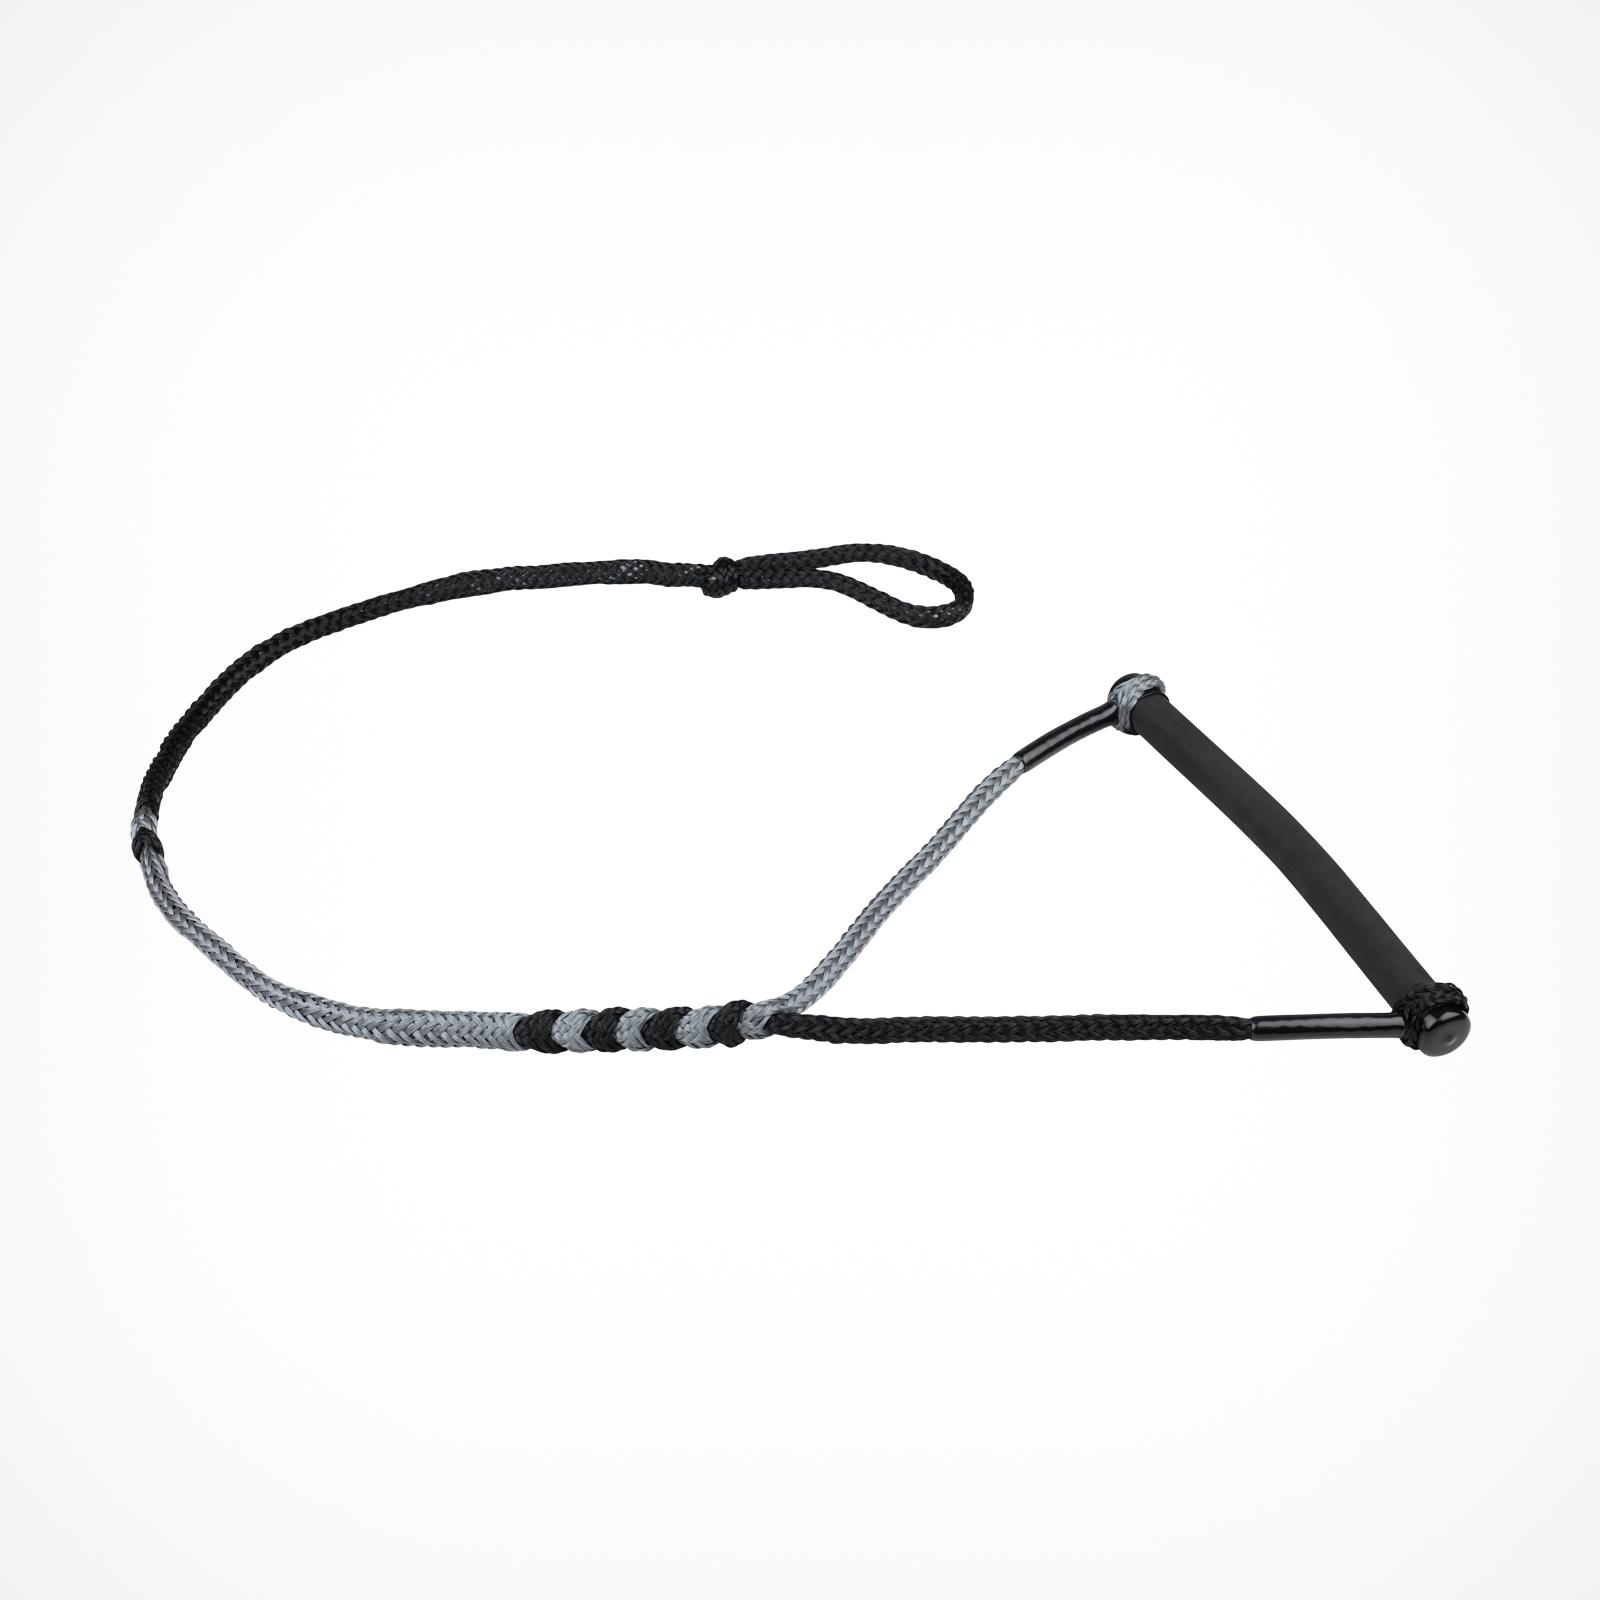 Masterline Slalom Handle Radius Custom, Mono Water ski handle, black grey, Product image